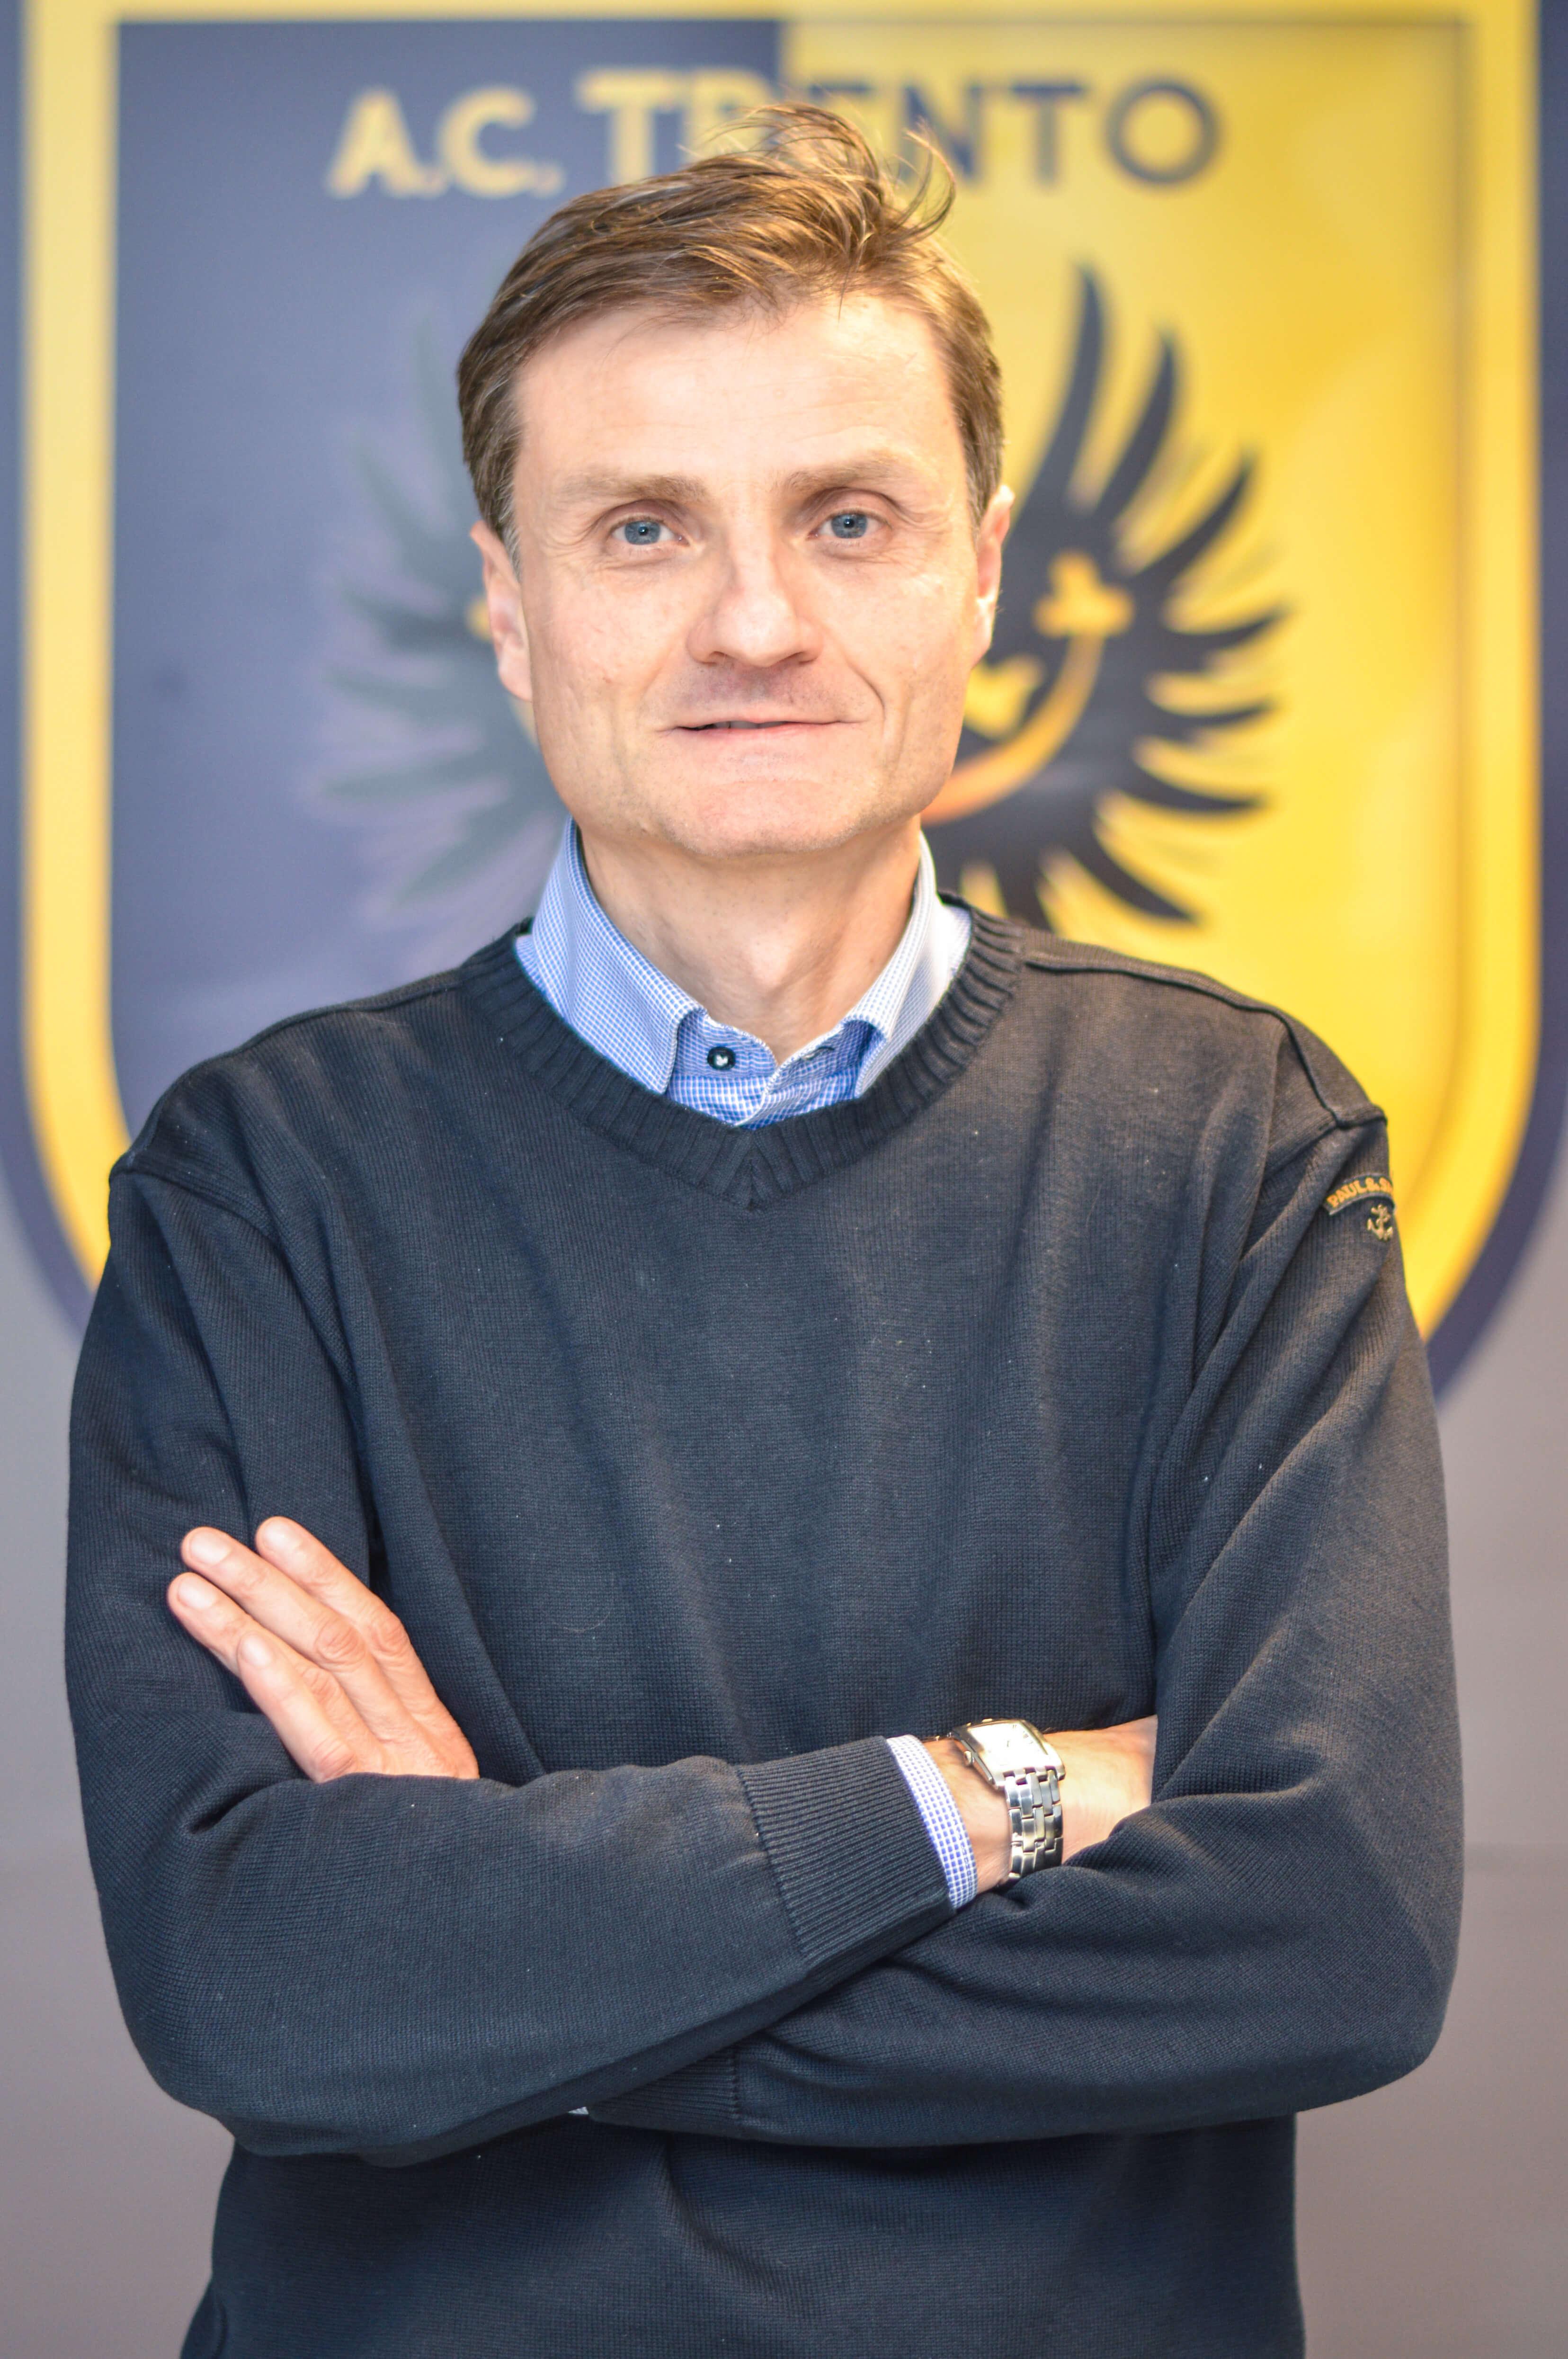 MARCO LORENZ Consigliere